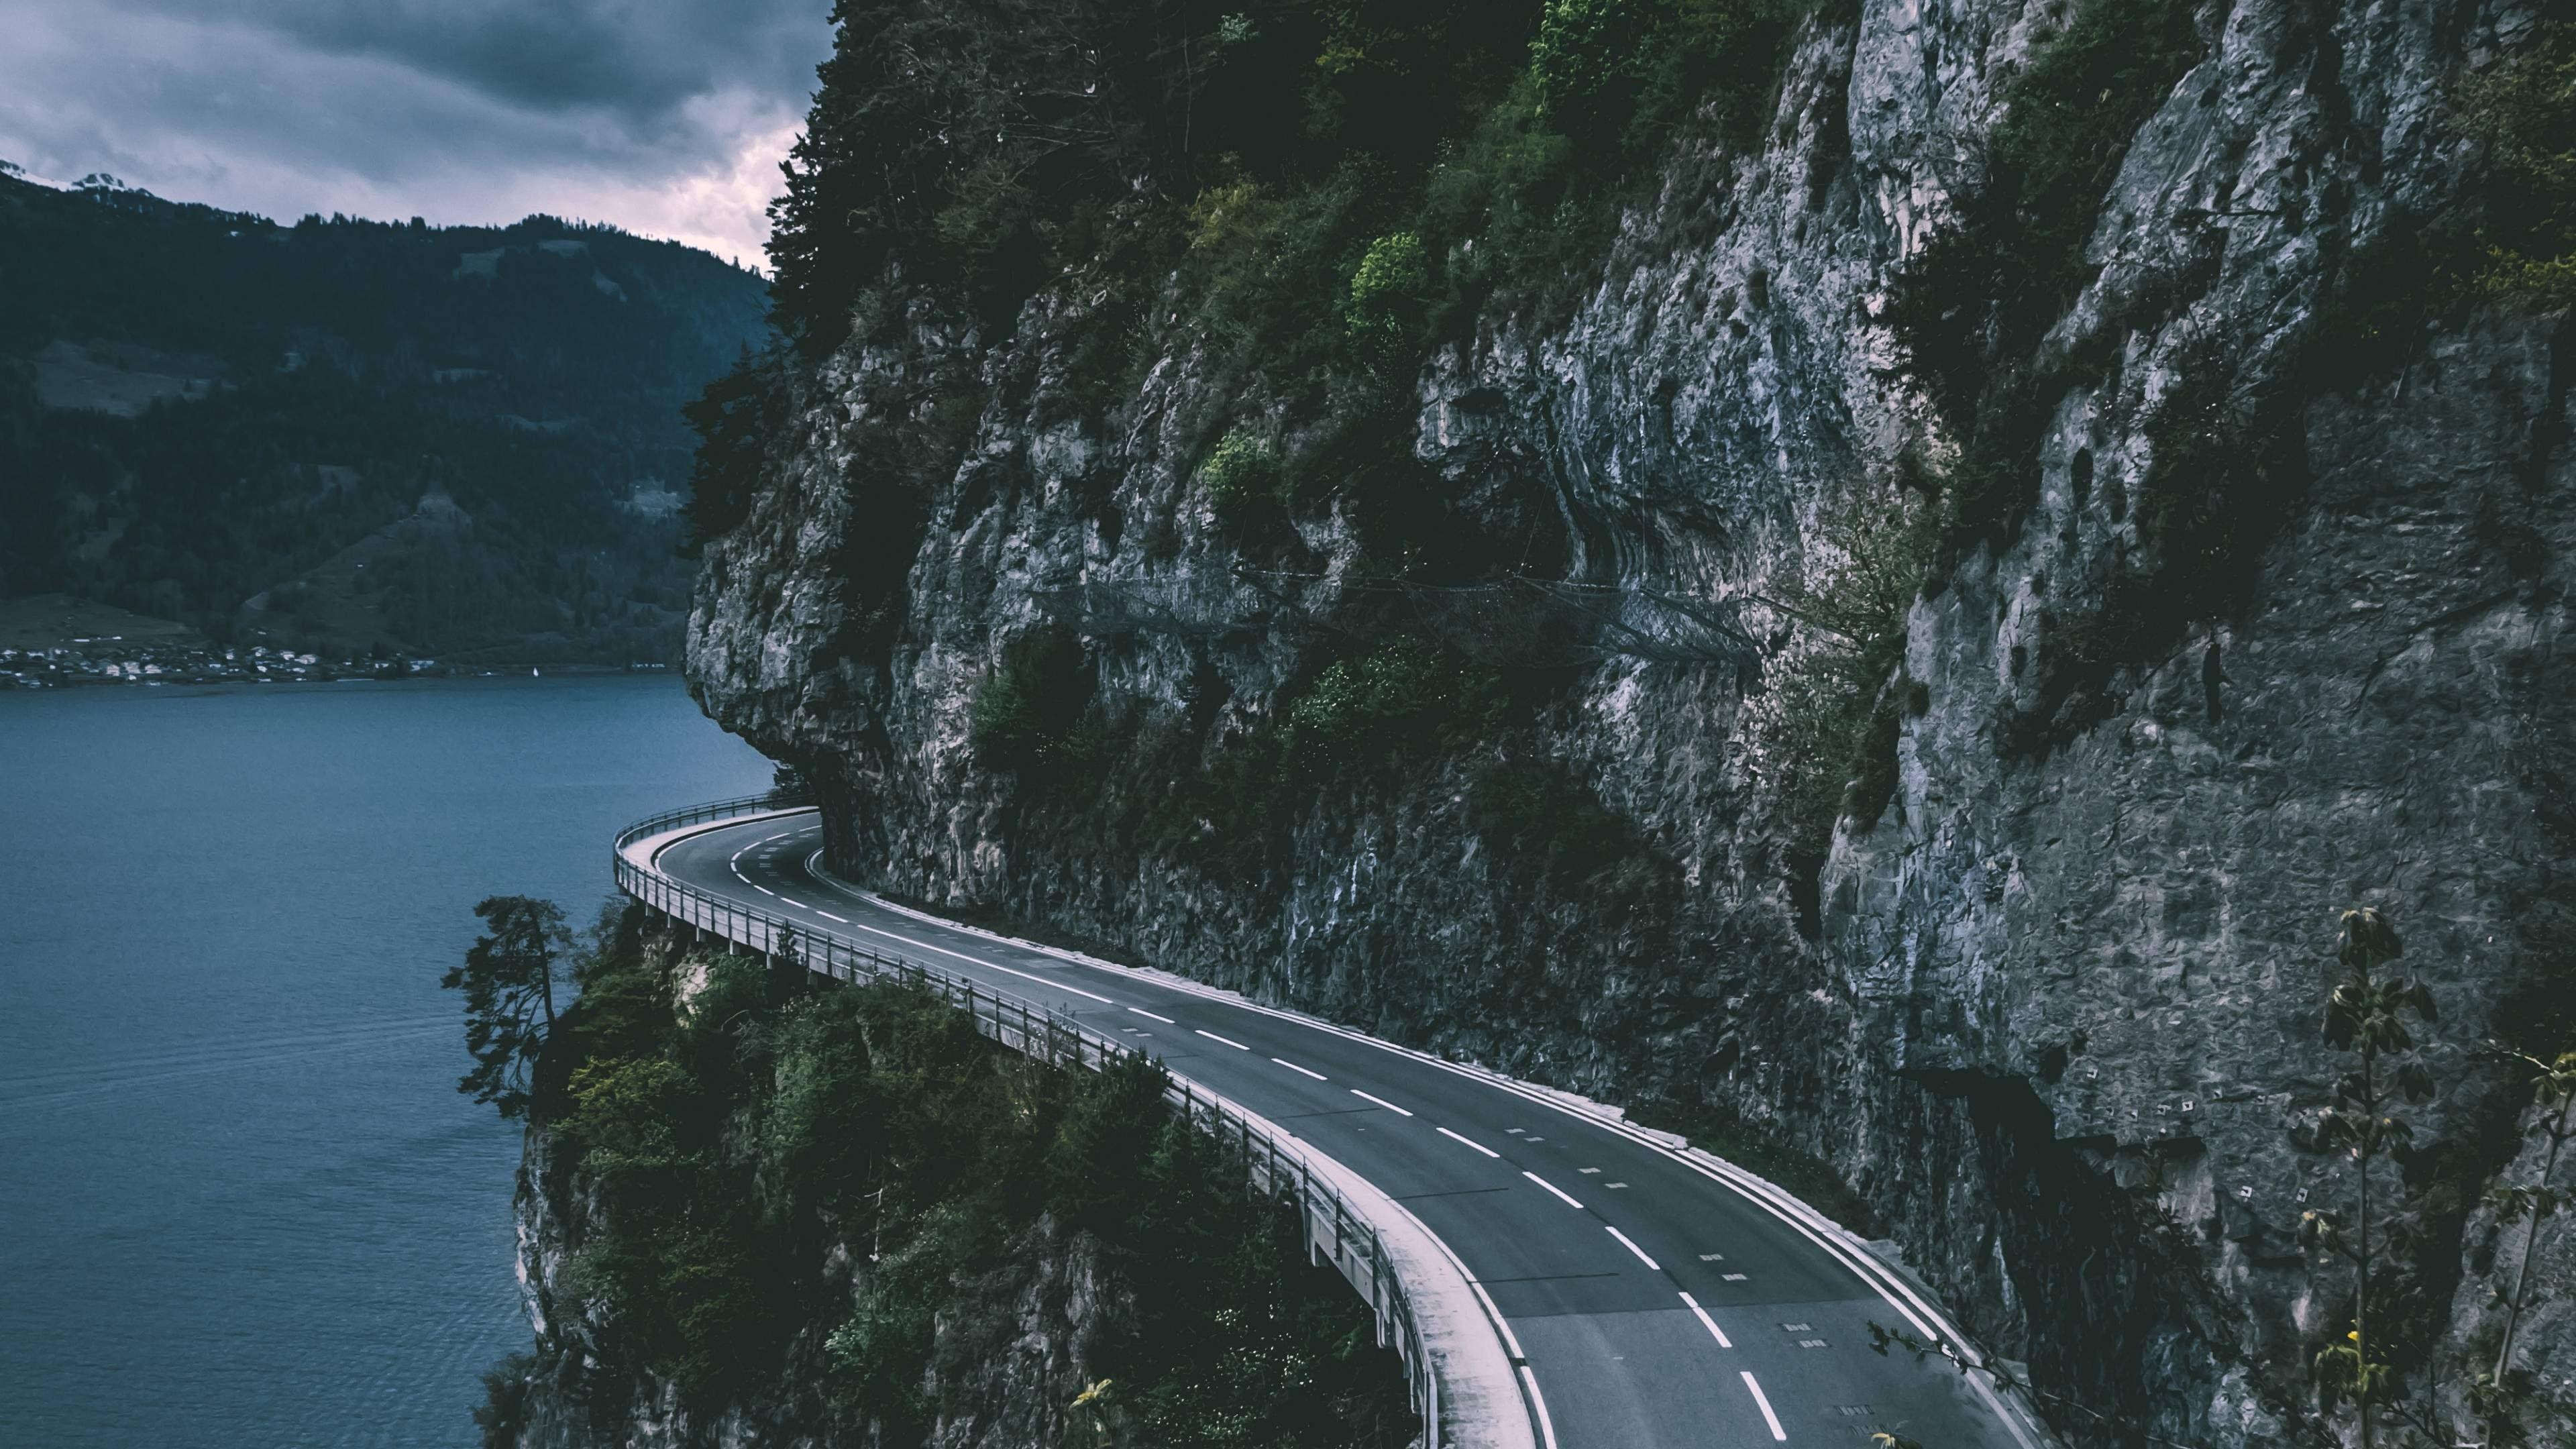 Mountain Road 4k Wallpaper Road Desktop Wallpapers Backgrounds Nature Hd wallpaper mountain road aerial view